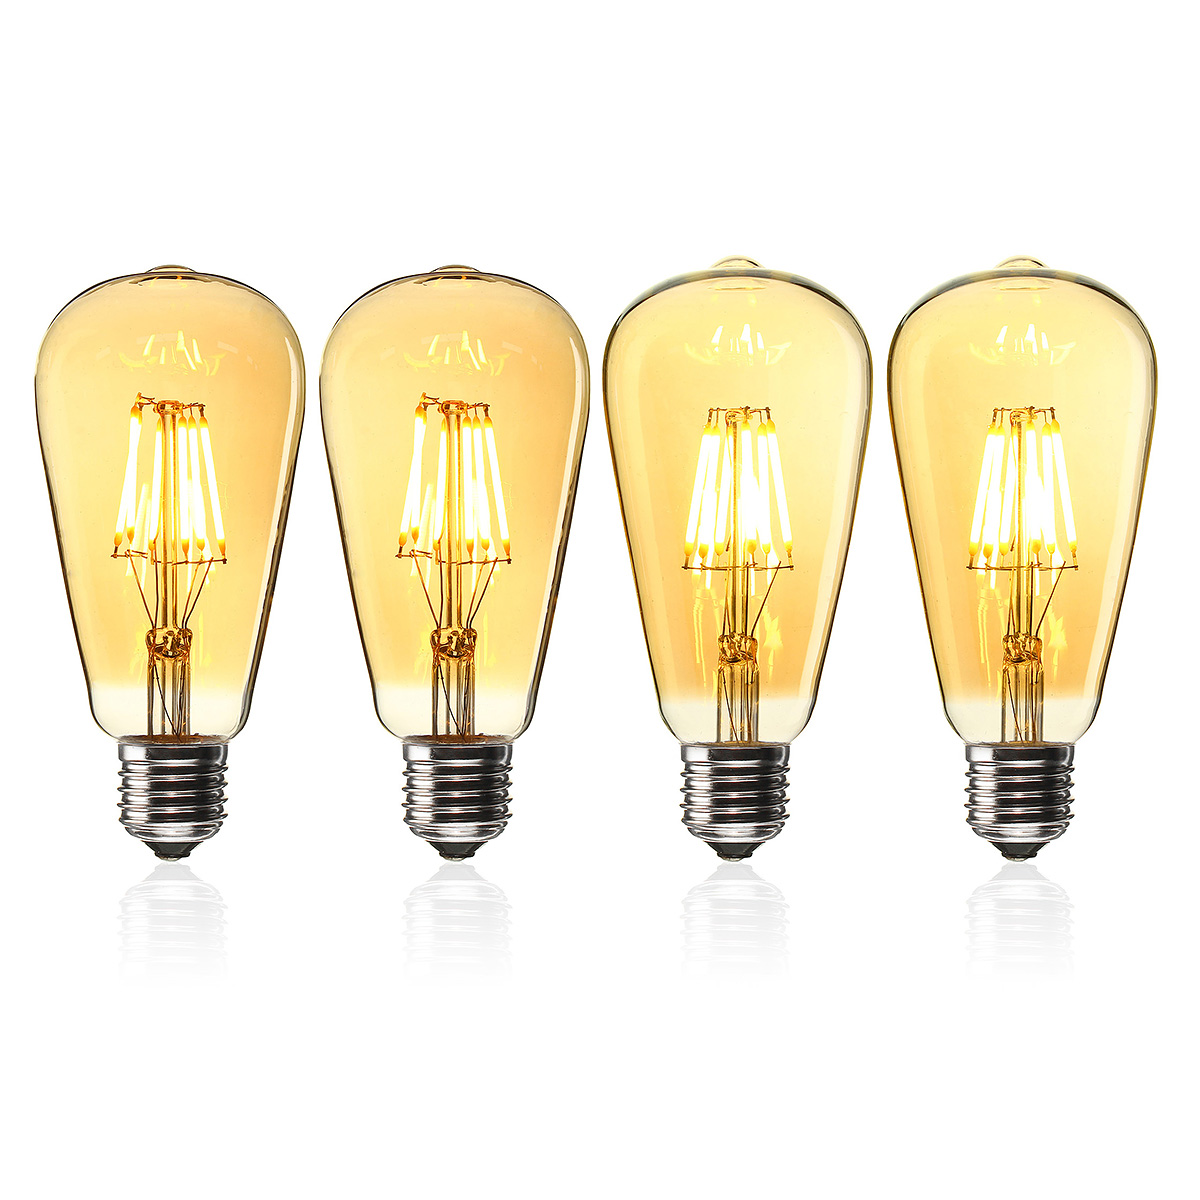 E27 ST64 6W Golden Cover Dimmable Edison Retro Vintage Filament COB LED Bulb Light Lamp AC110/220V